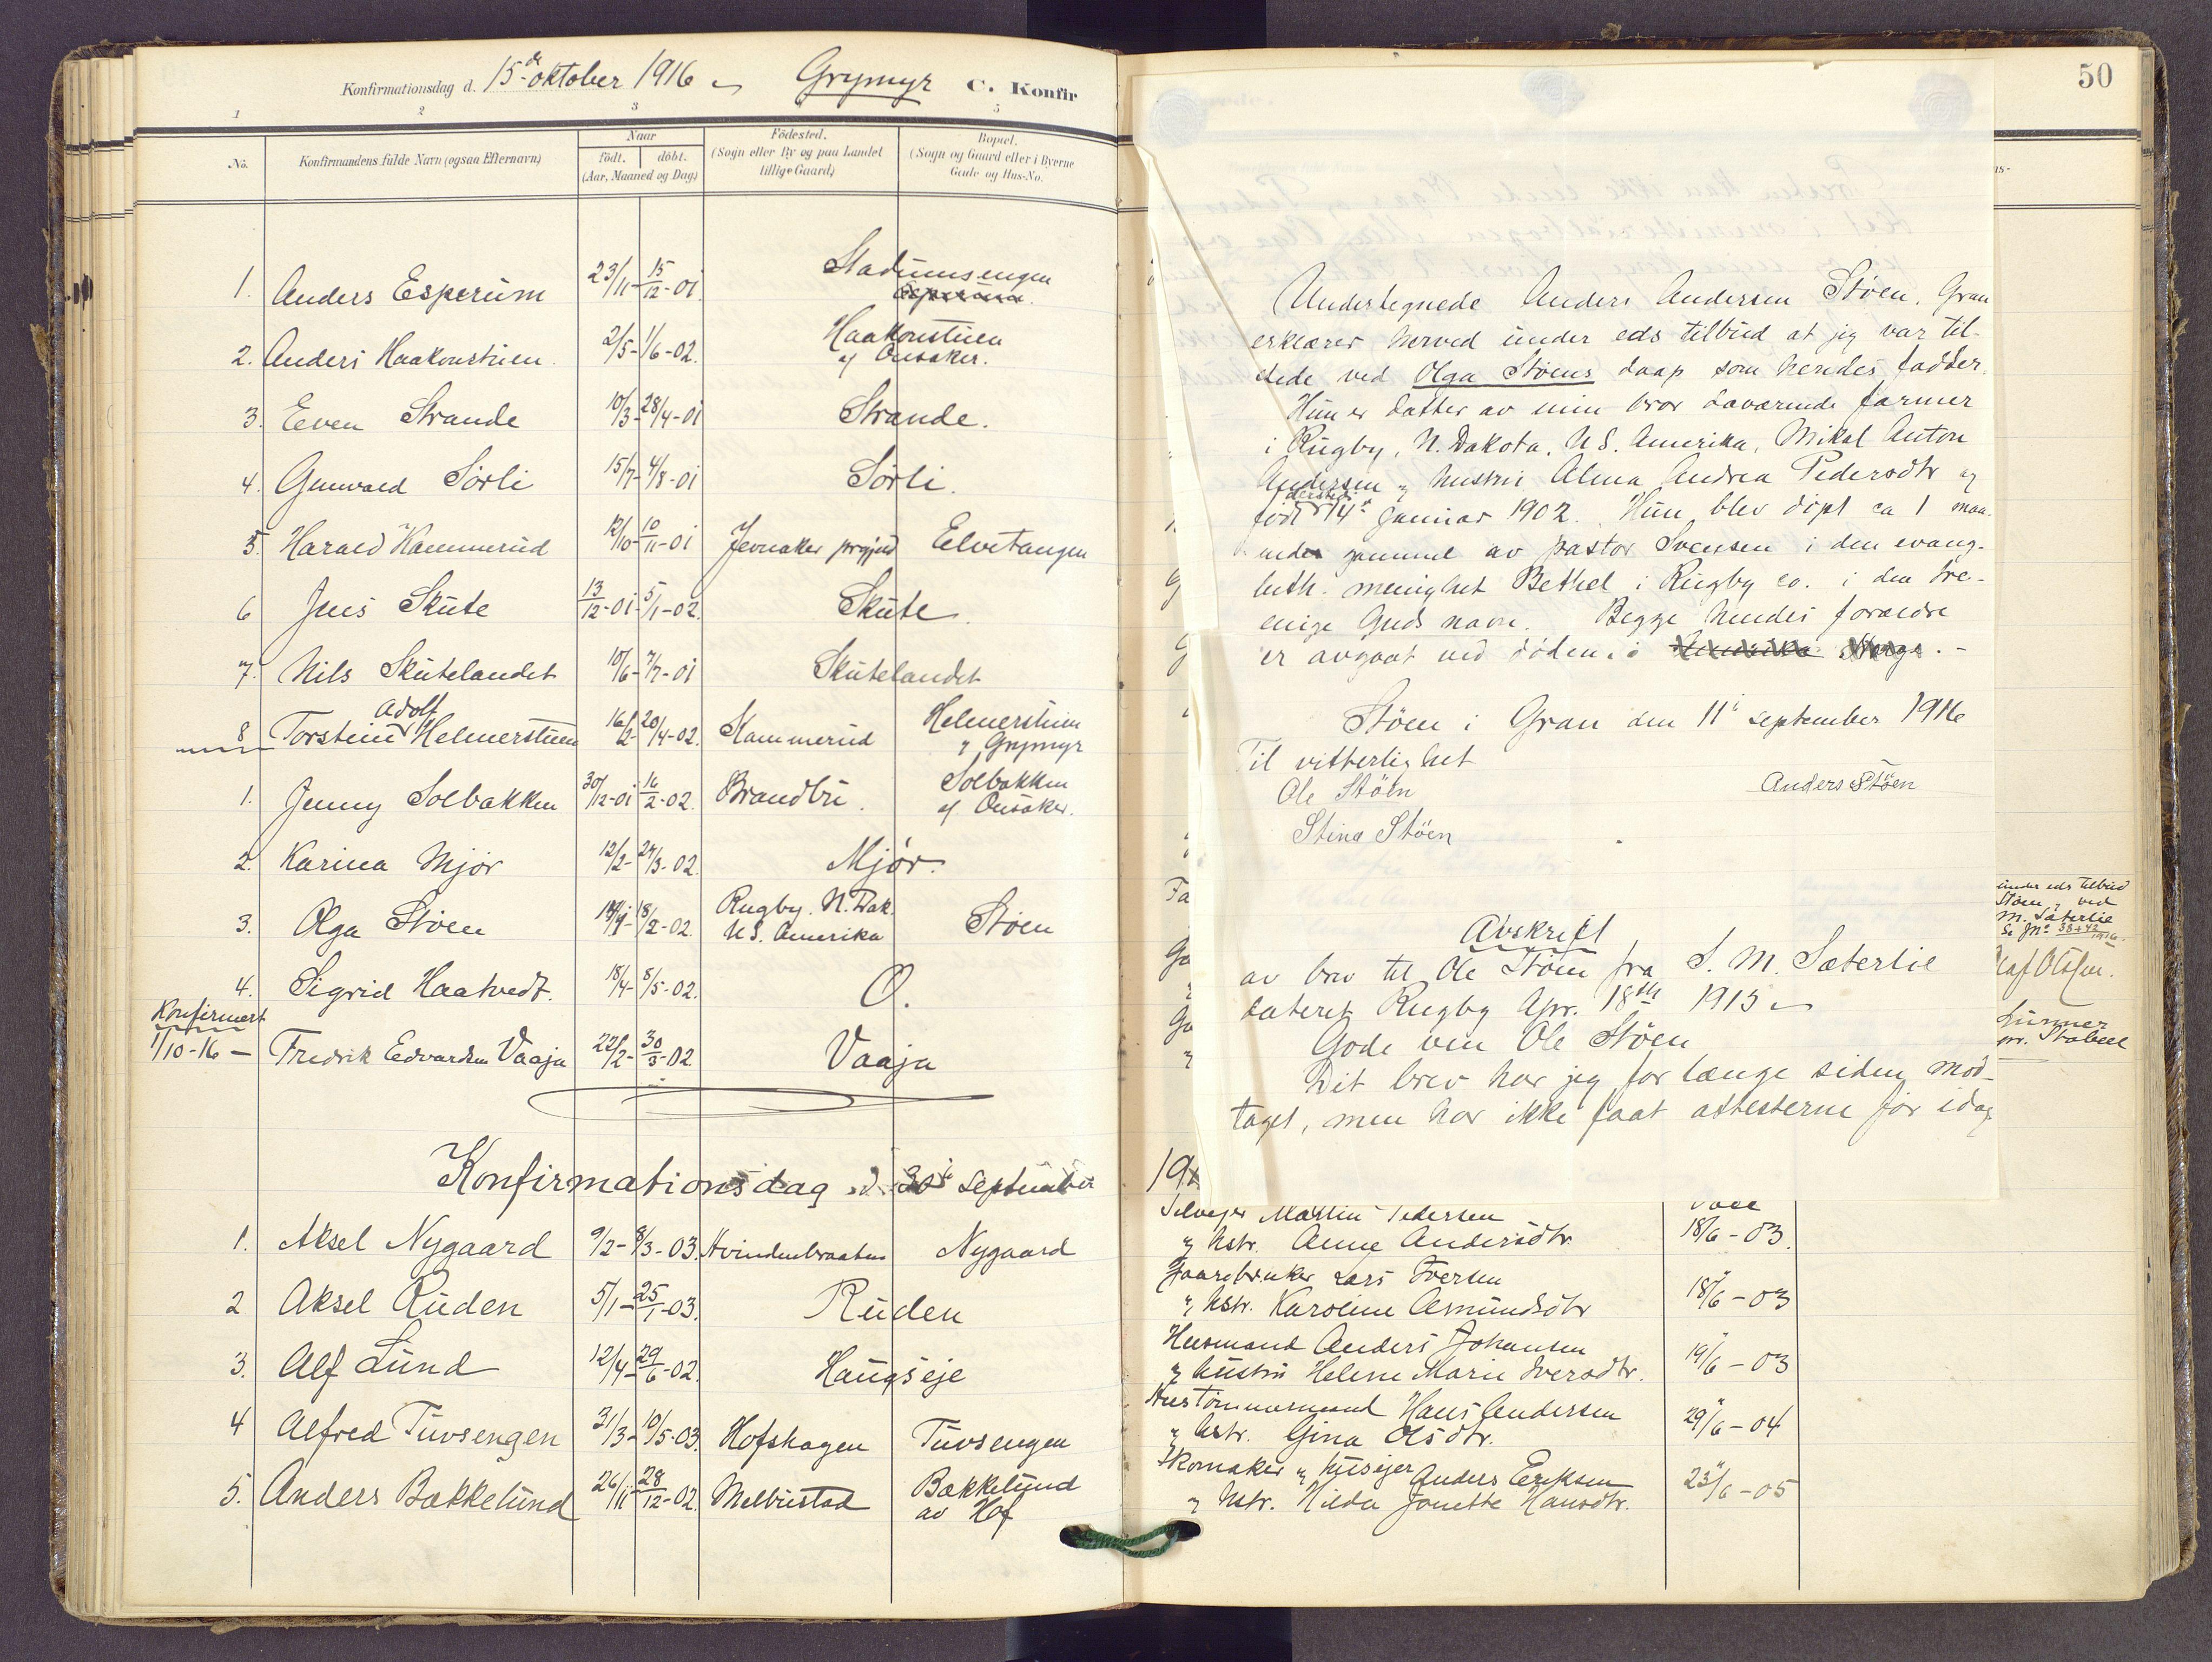 SAH, Gran prestekontor, Ministerialbok nr. 22, 1908-1918, s. 50